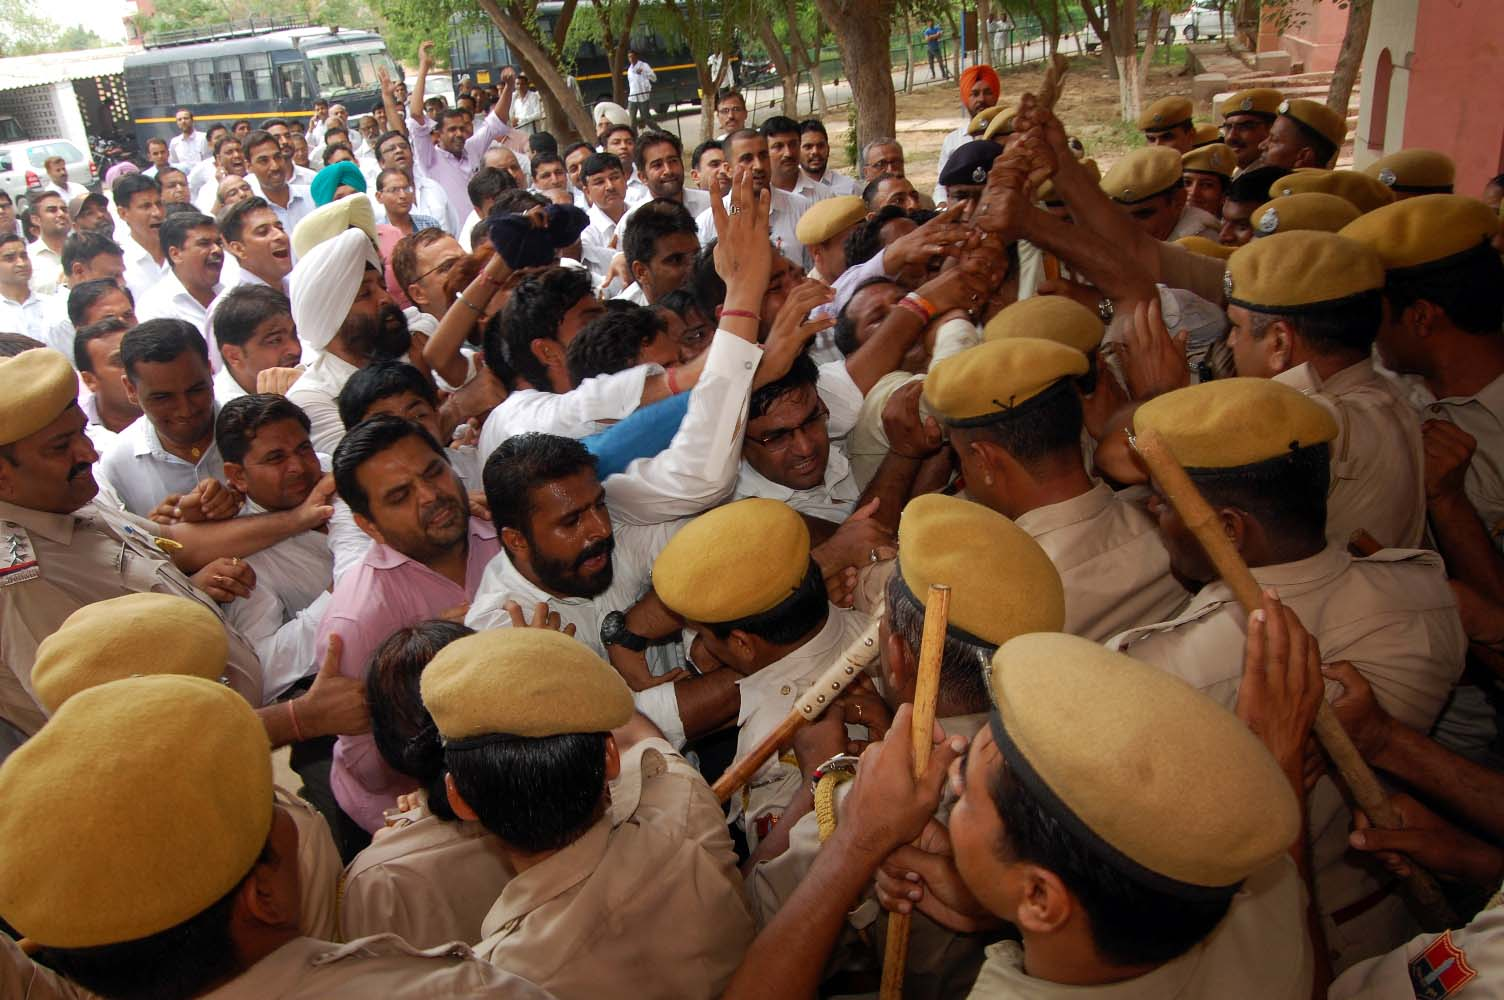 Agitation, Lawyers, Clash, Policemen, Angry, Rajasthan